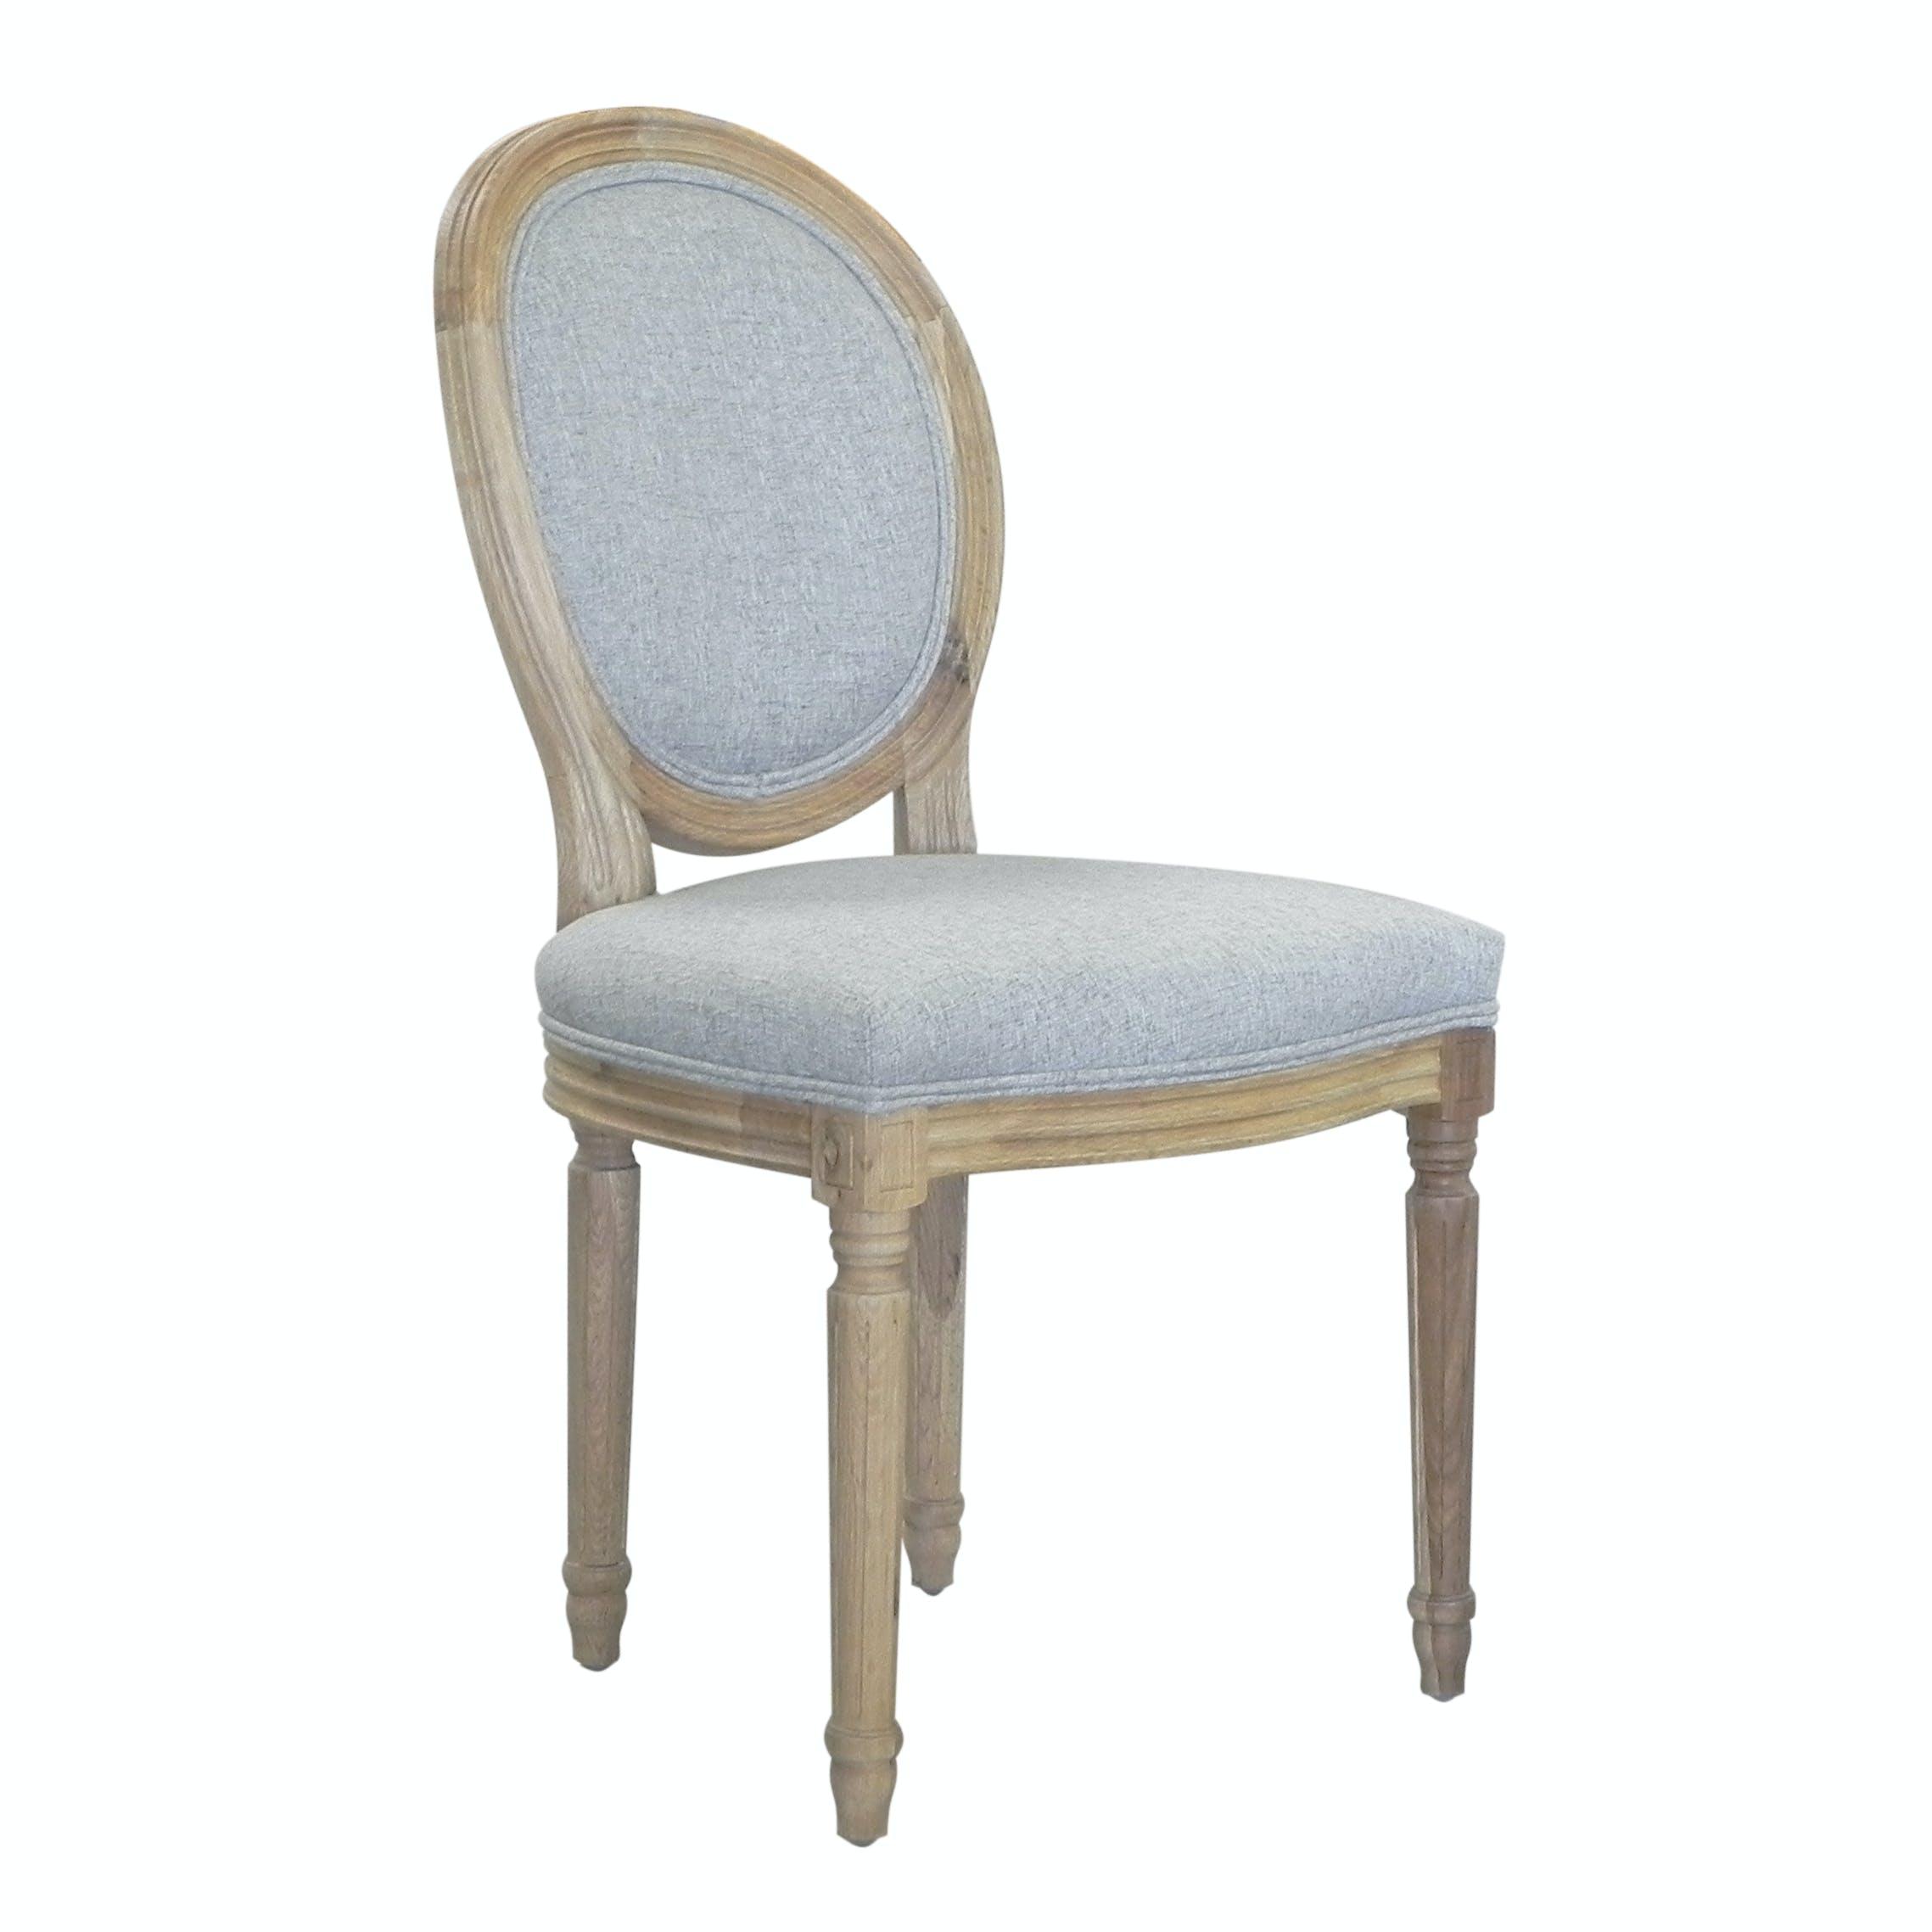 Chaise médaillon tissu gris MEDICIS réf 30020881